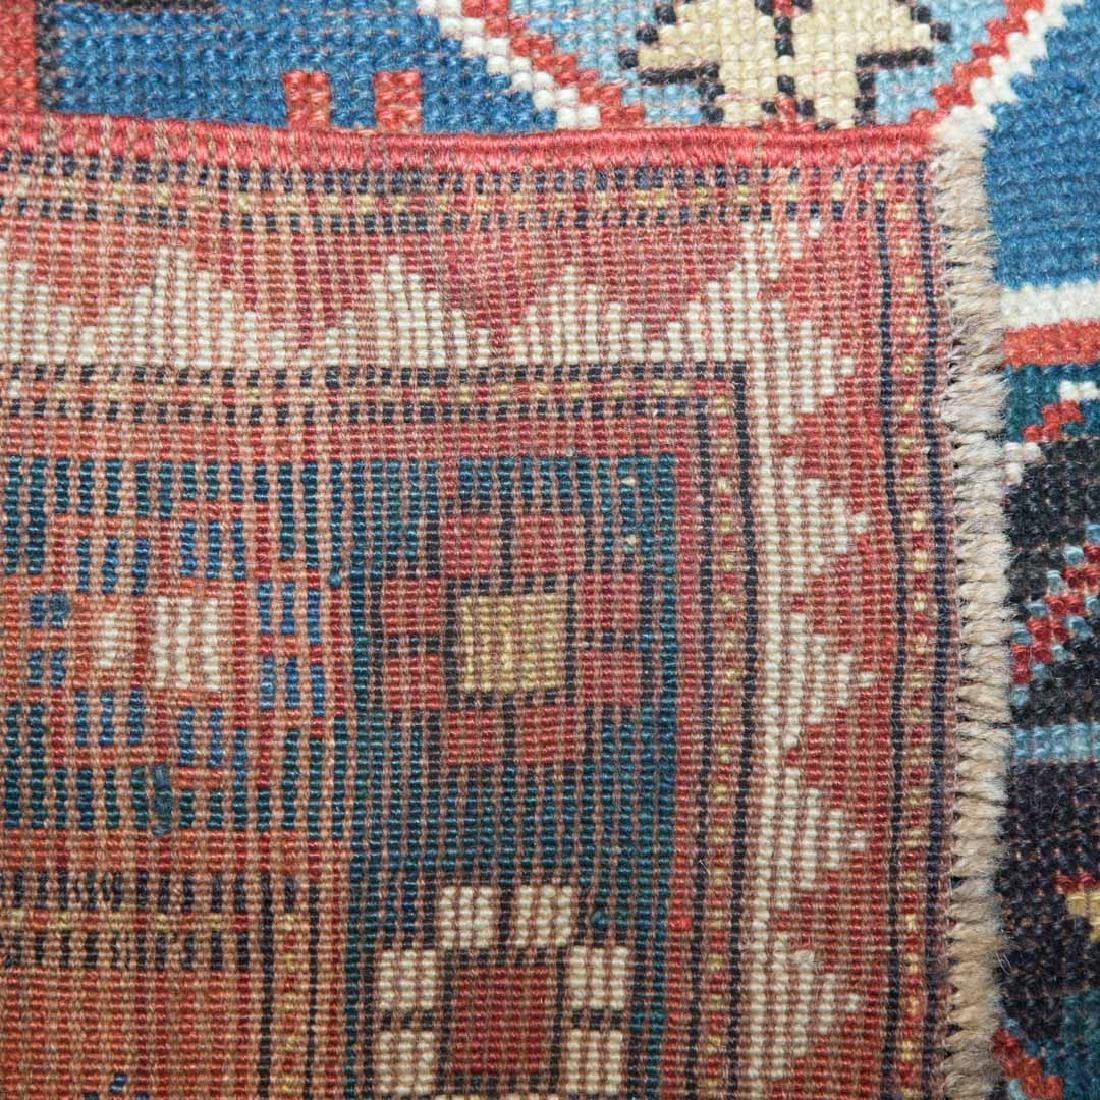 Antique Kazak rug, approx. 3.10 x 7.7 - 3